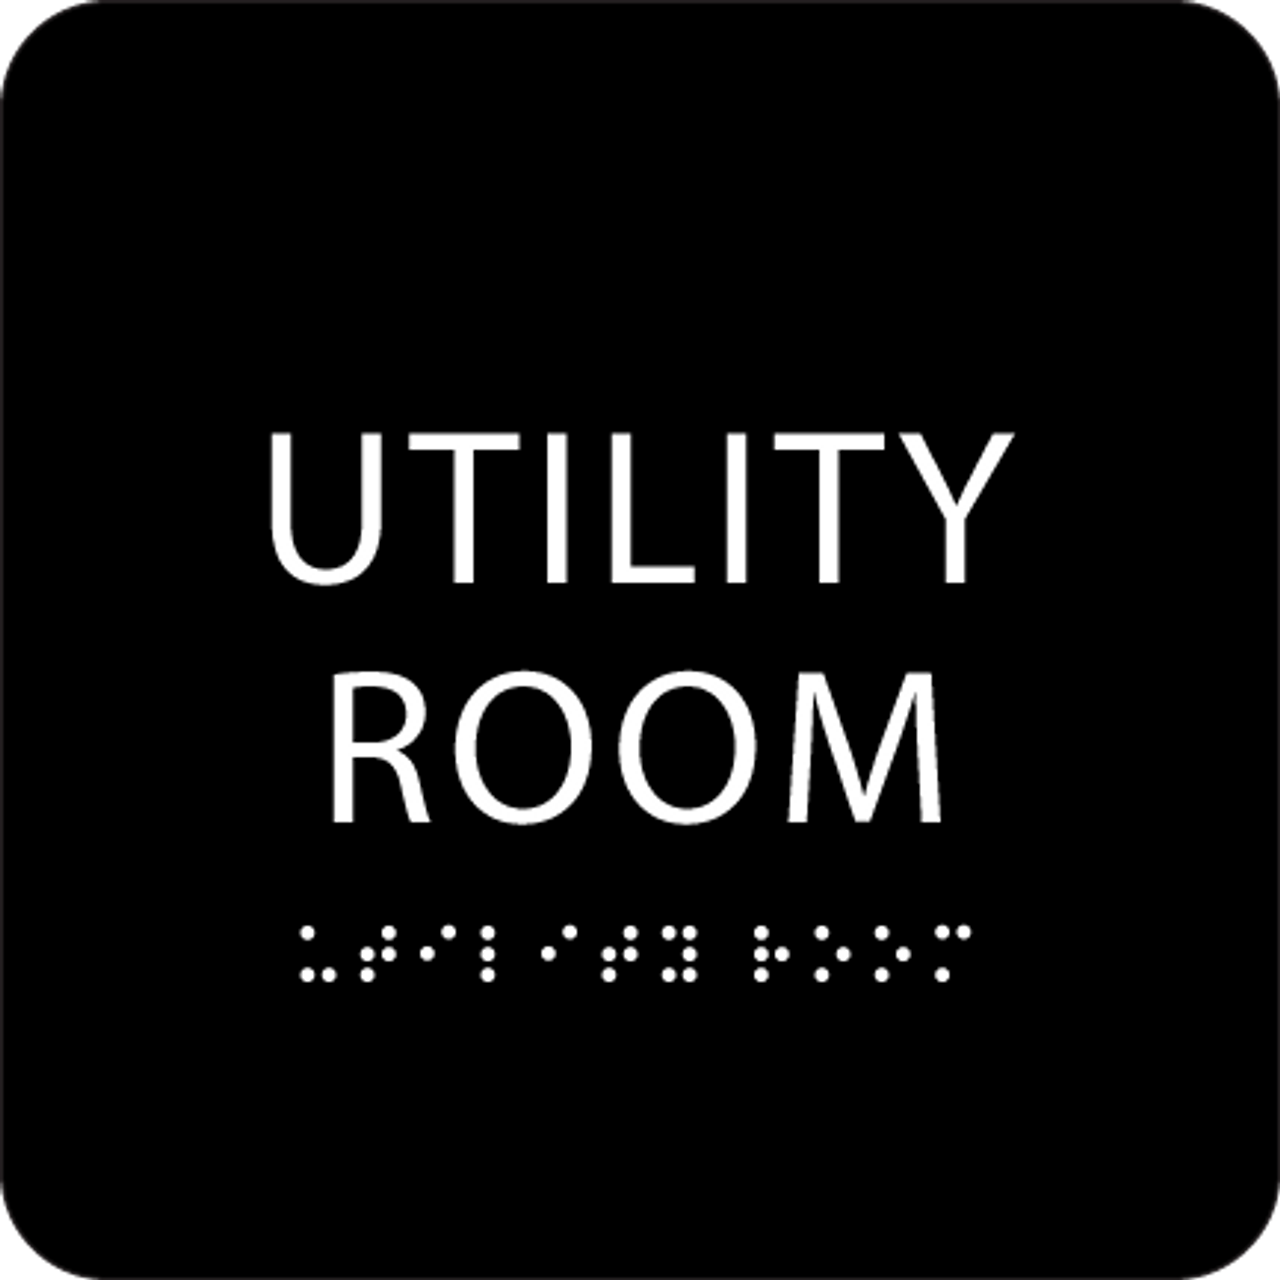 Black Utility Room ADA Sign